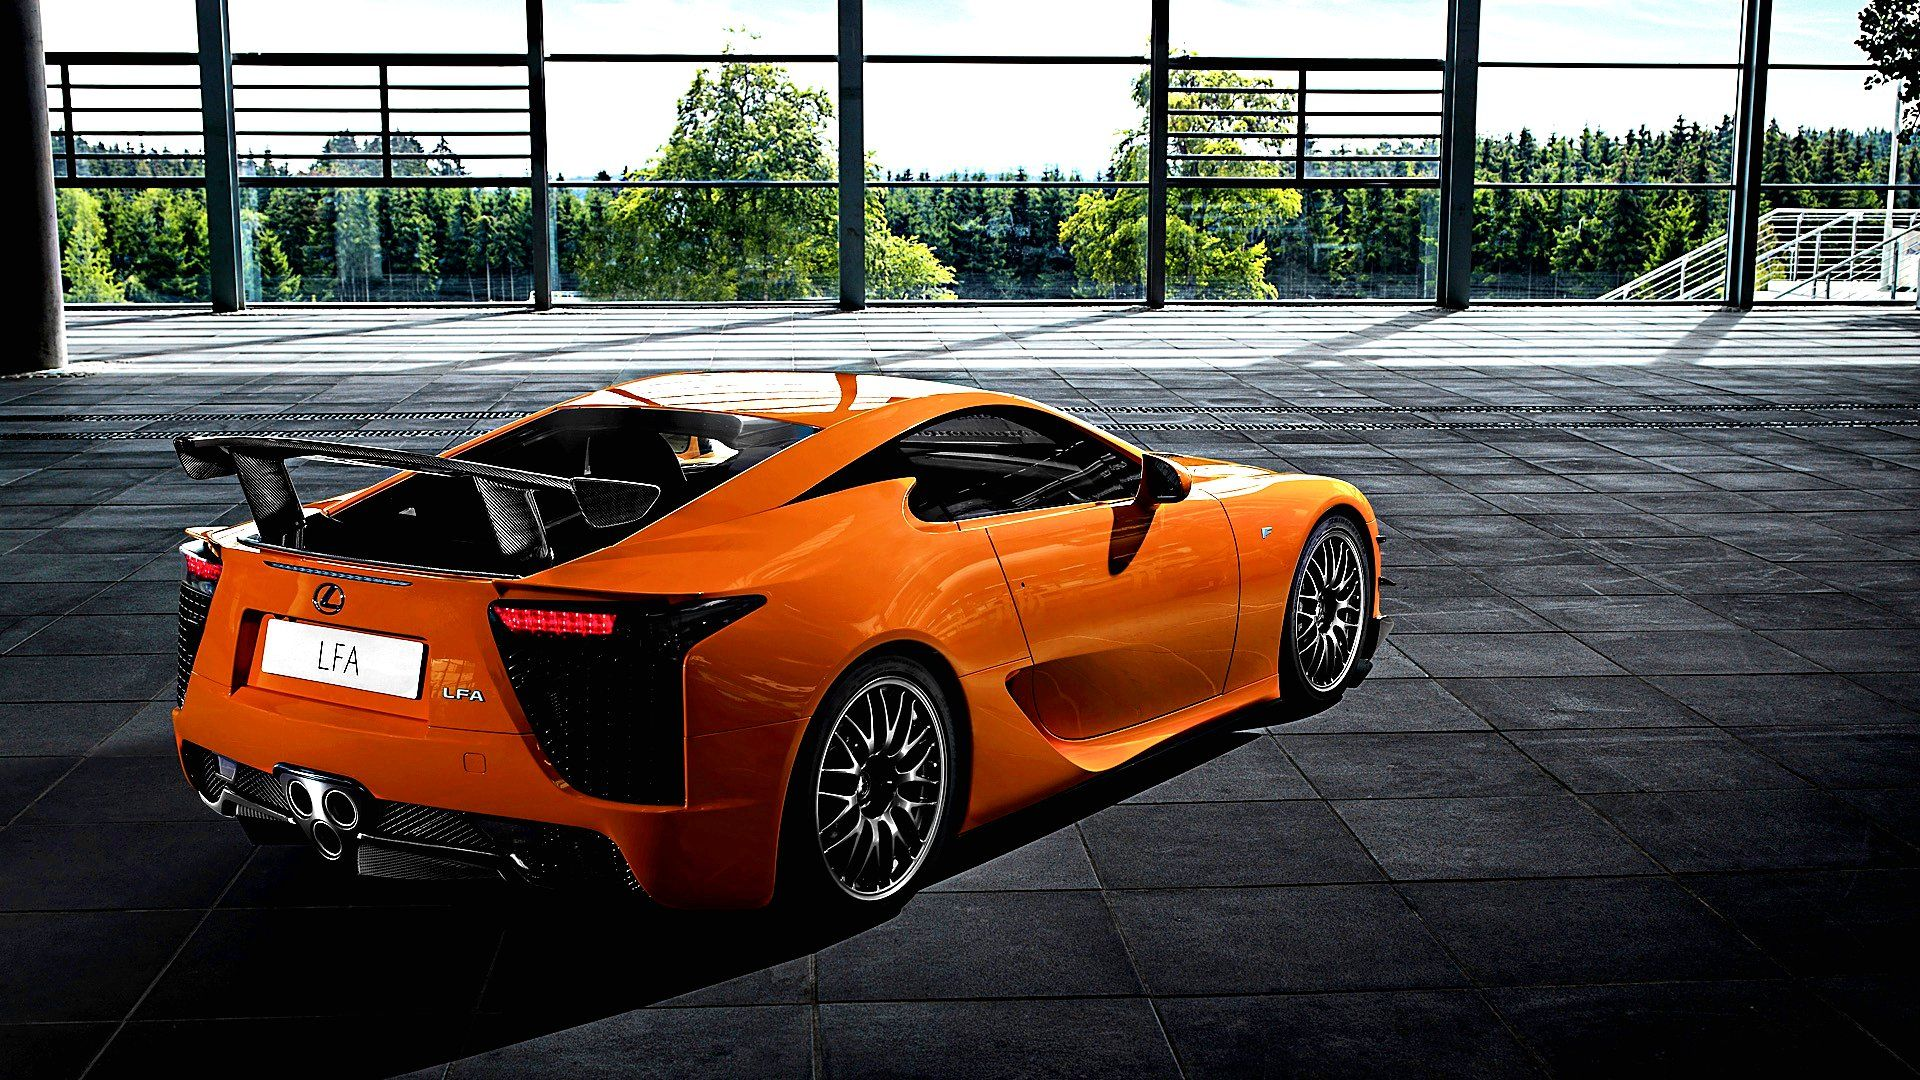 Lexus Lfa Wallpapers Top Free Lexus Lfa Backgrounds Wallpaperaccess